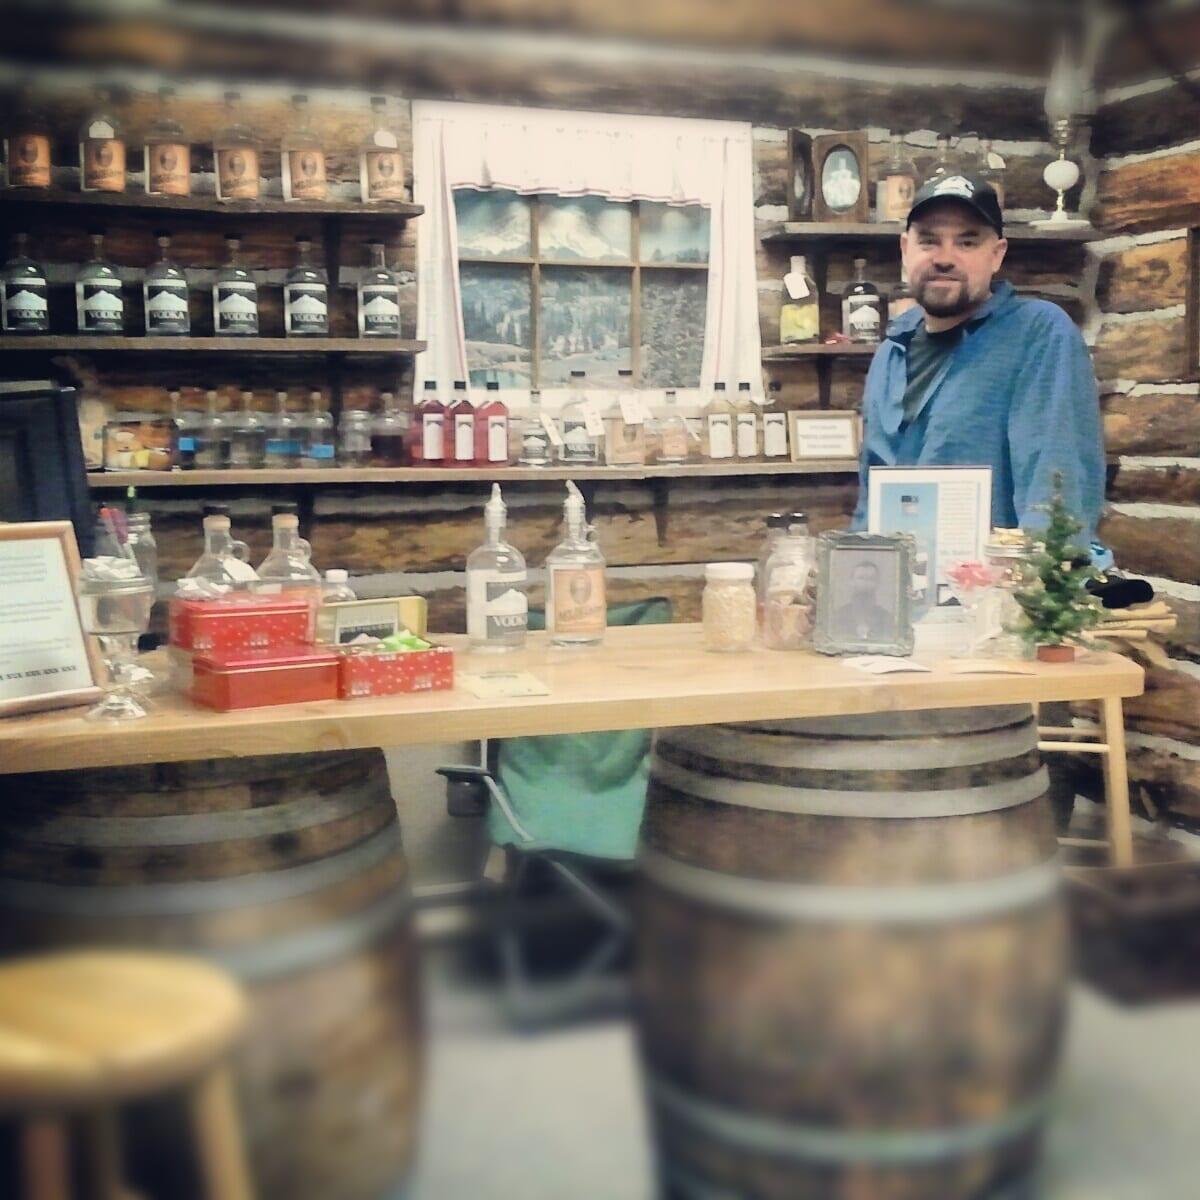 Bellingham distilleries, craft spirits